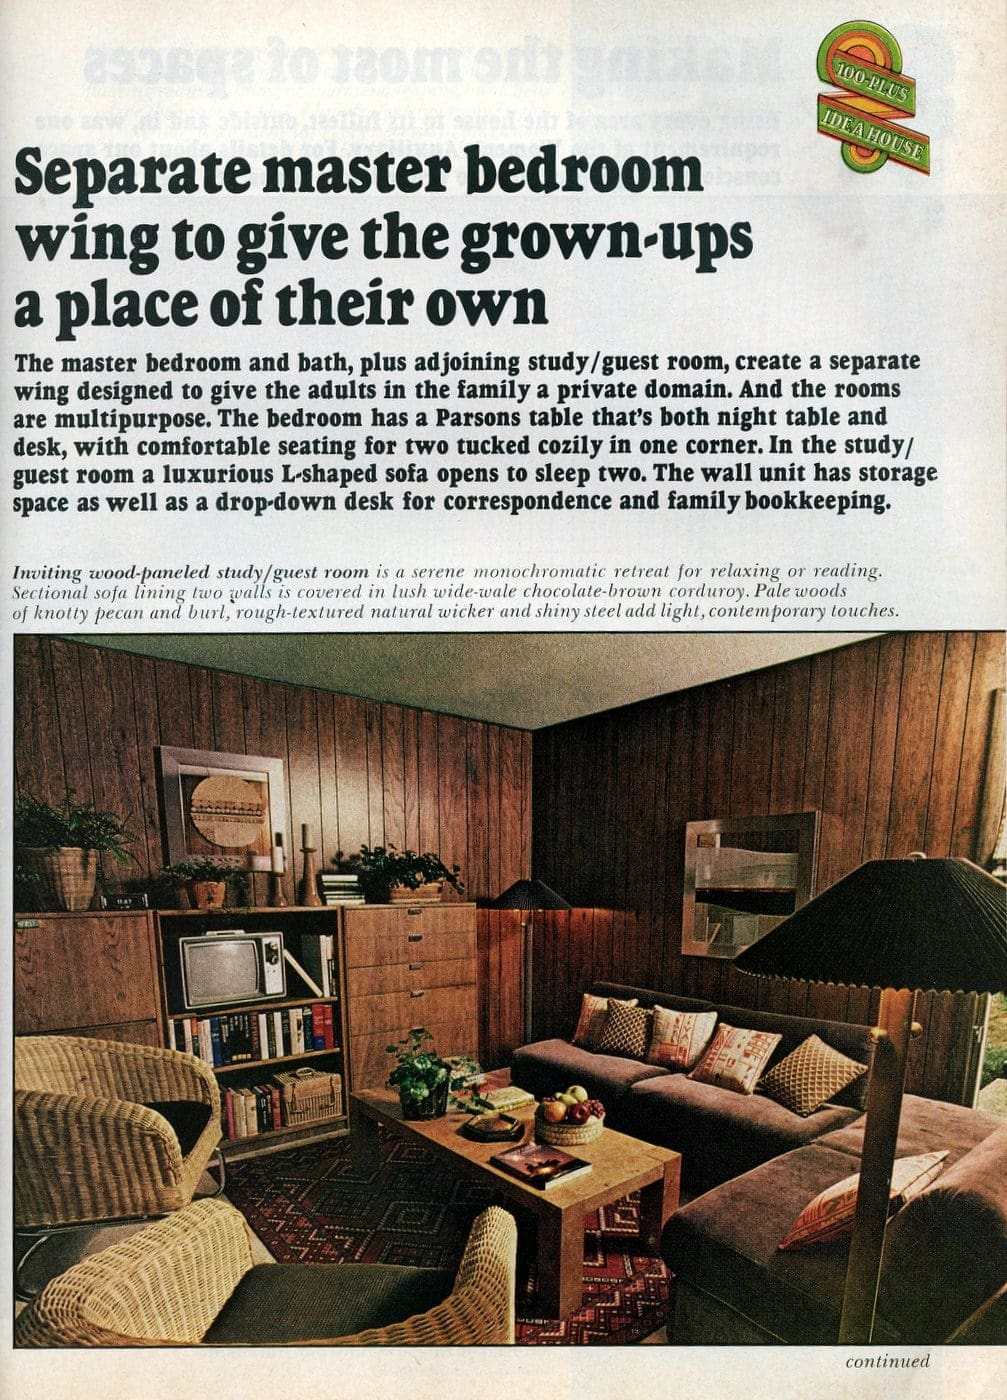 Beautiful practical 1975 model home - Separate master bedroom wing